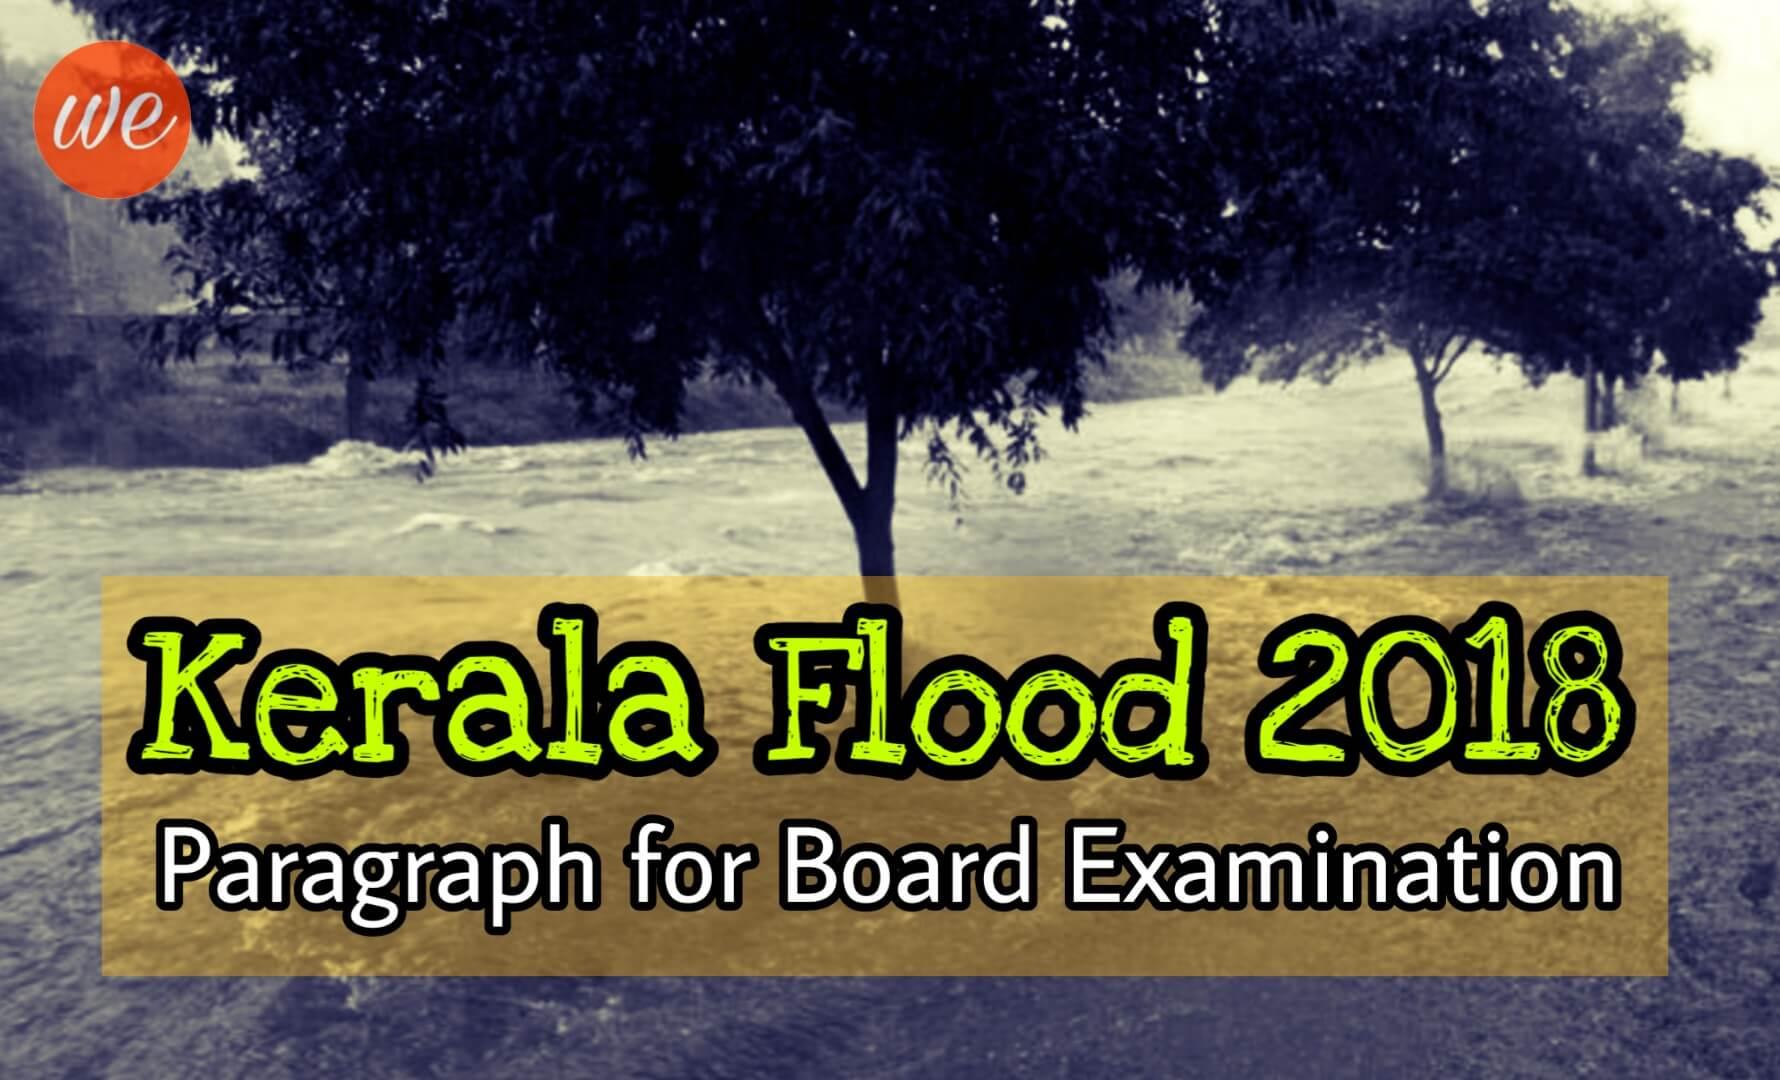 Kerala Flood 2018 Paragraph